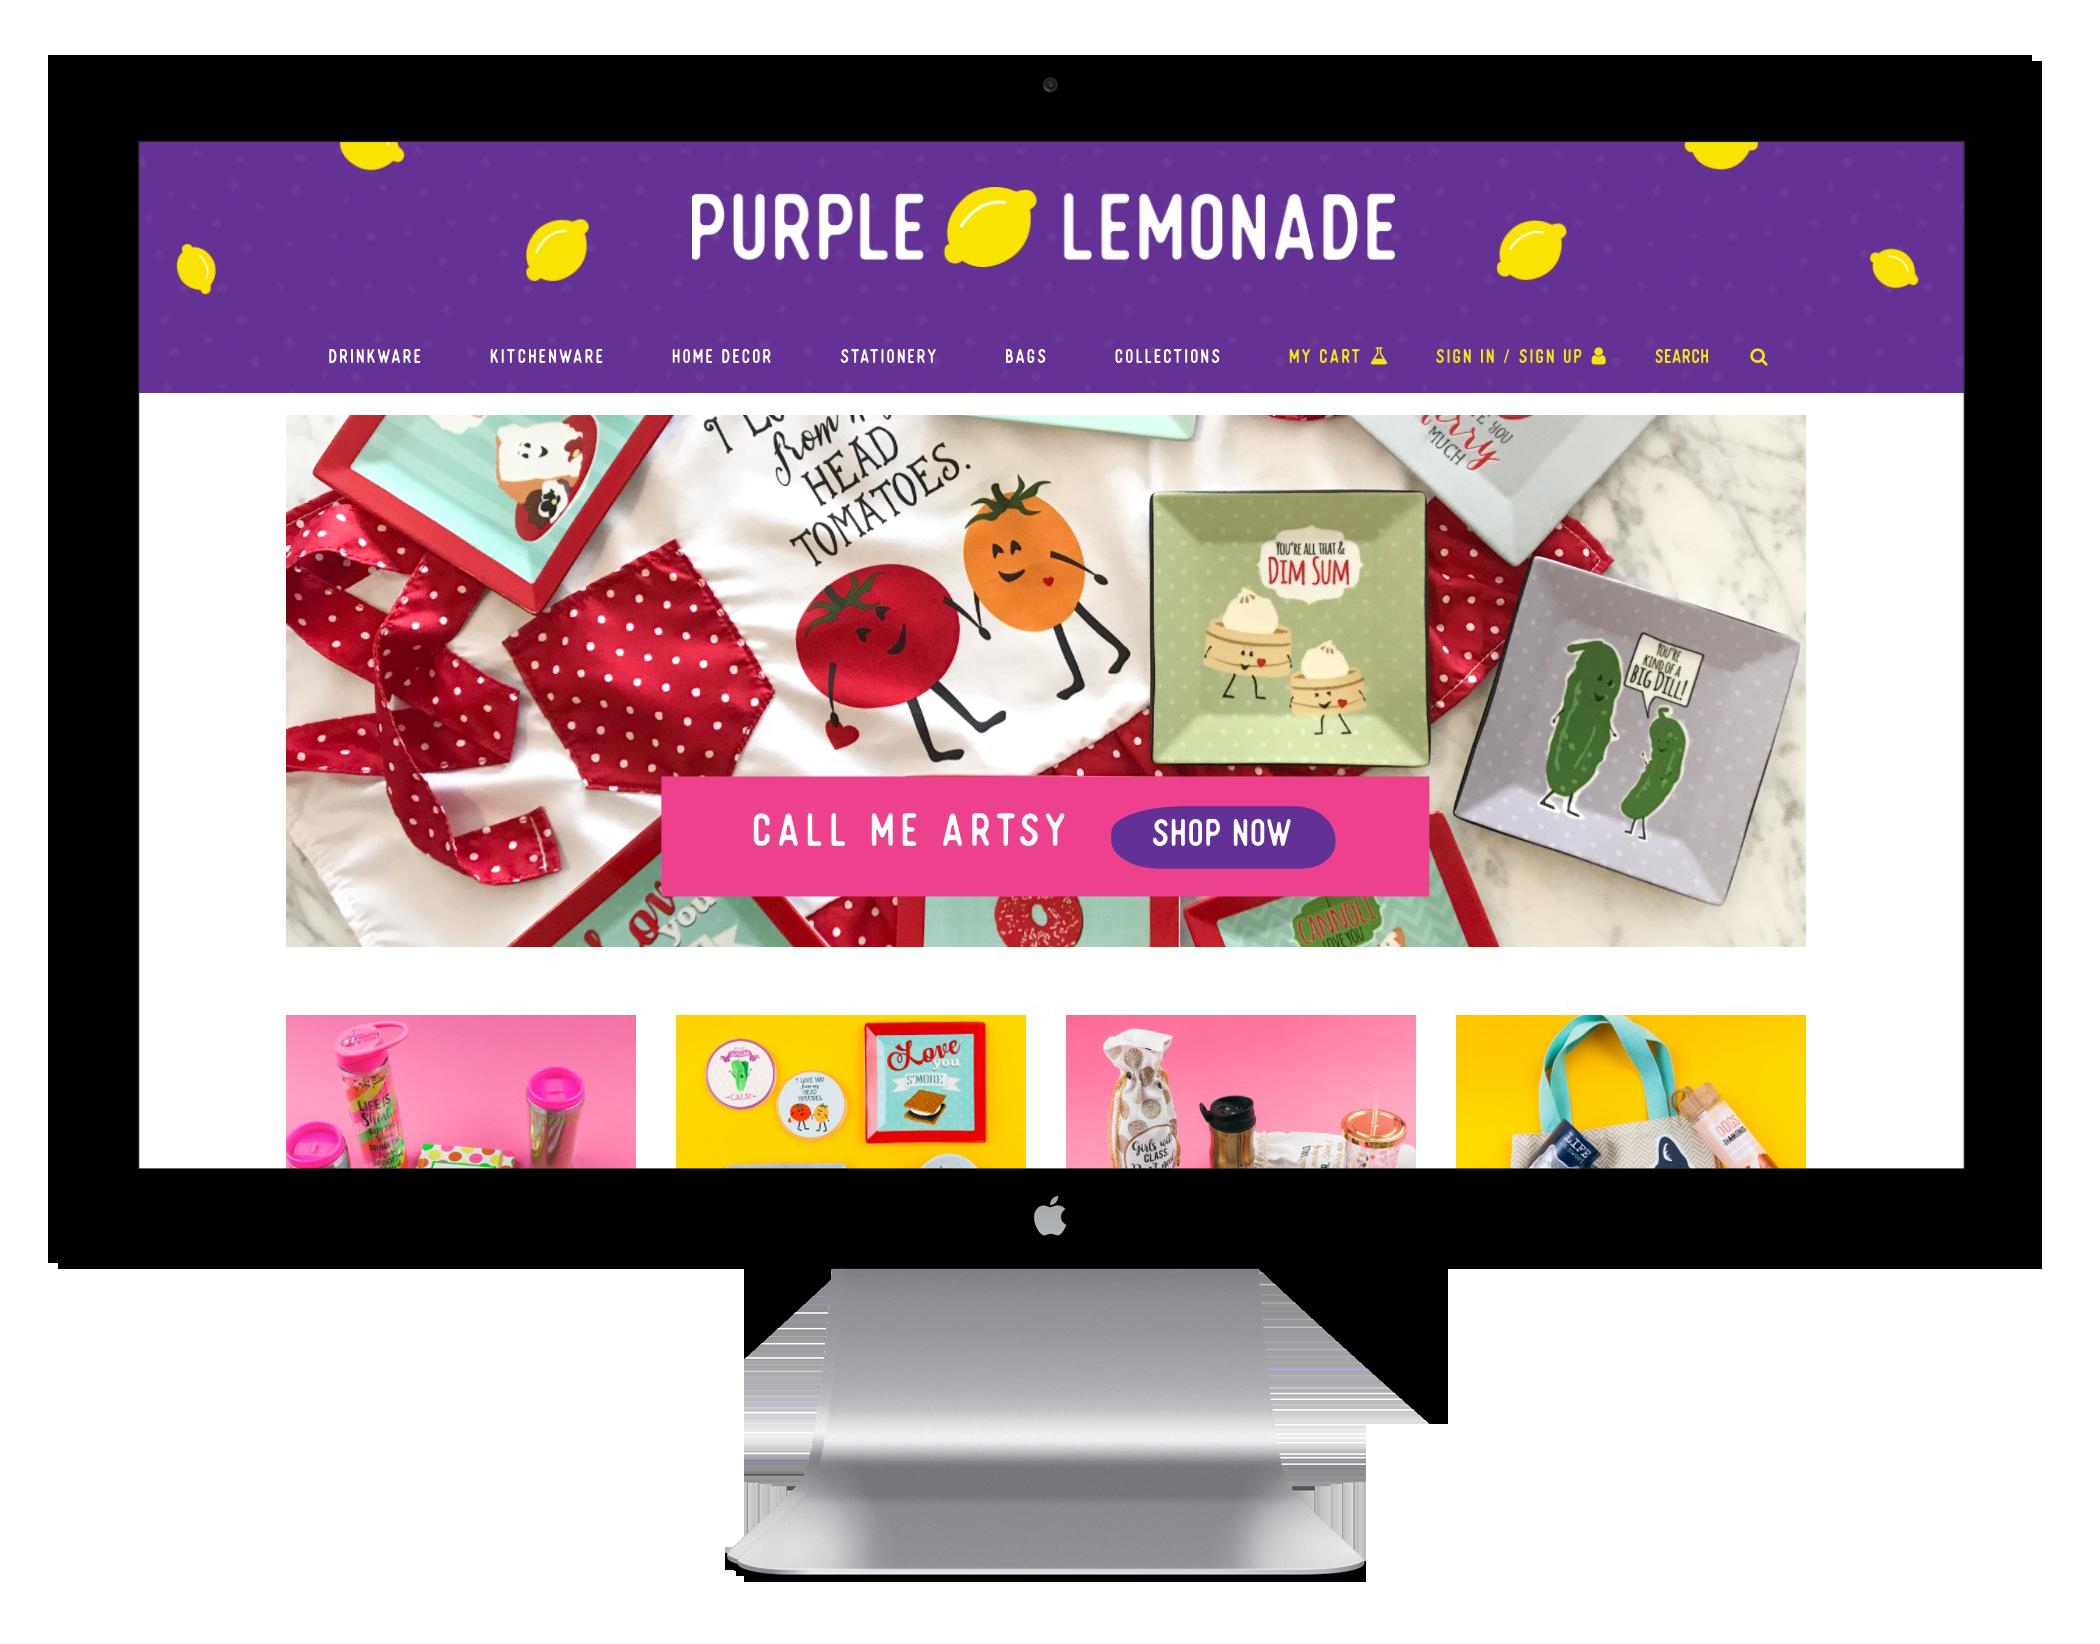 devaworks-website-design-purple-lemonade.png